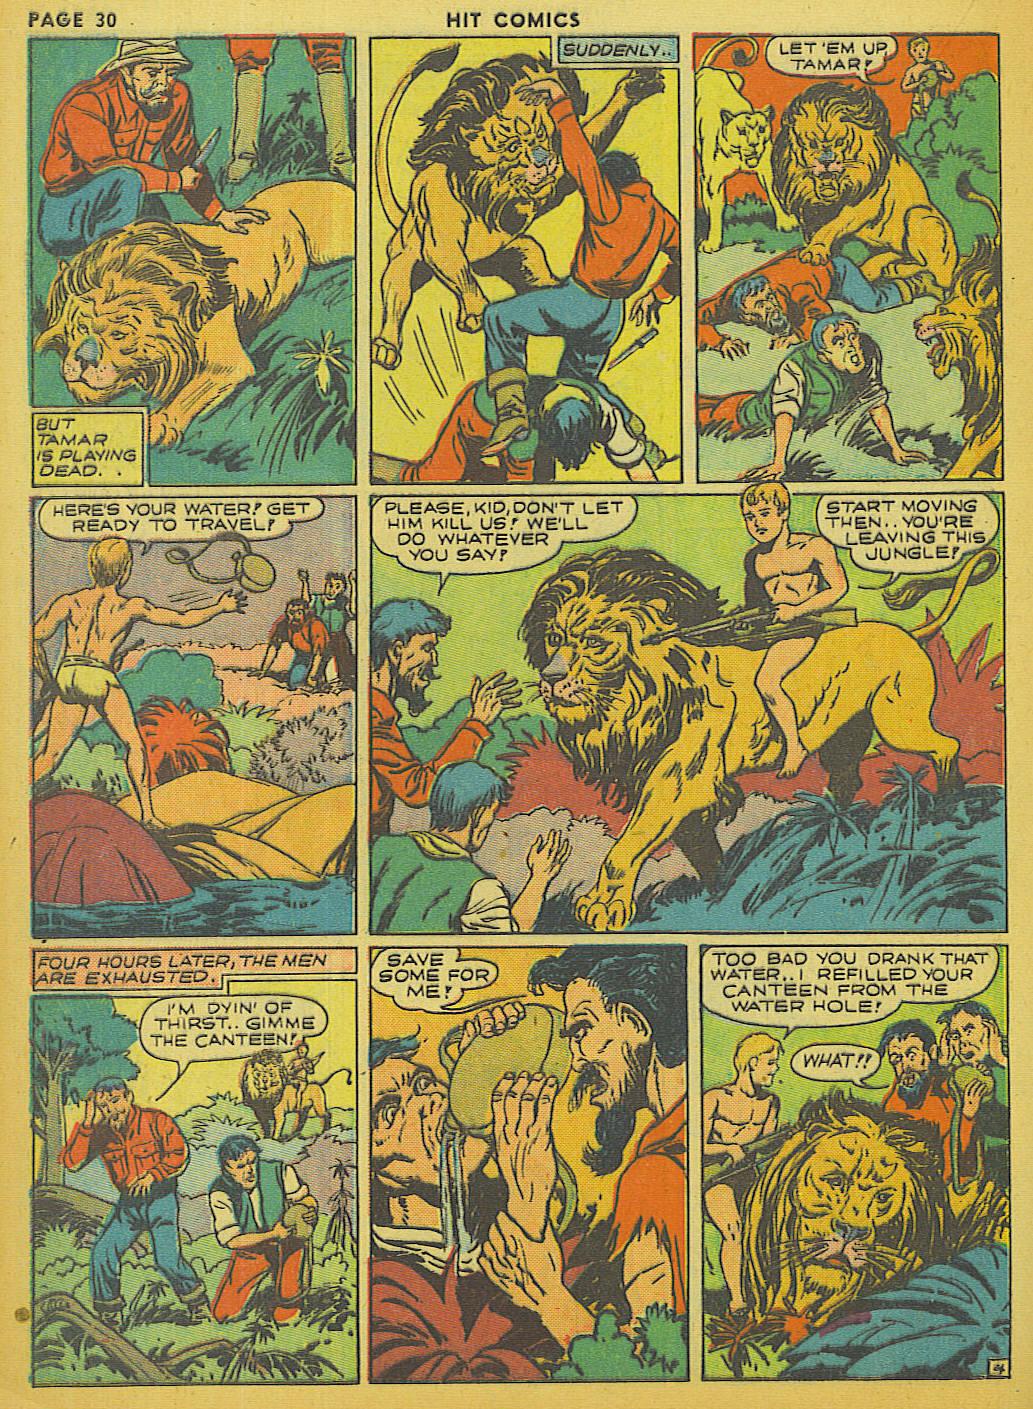 Read online Hit Comics comic -  Issue #13 - 32